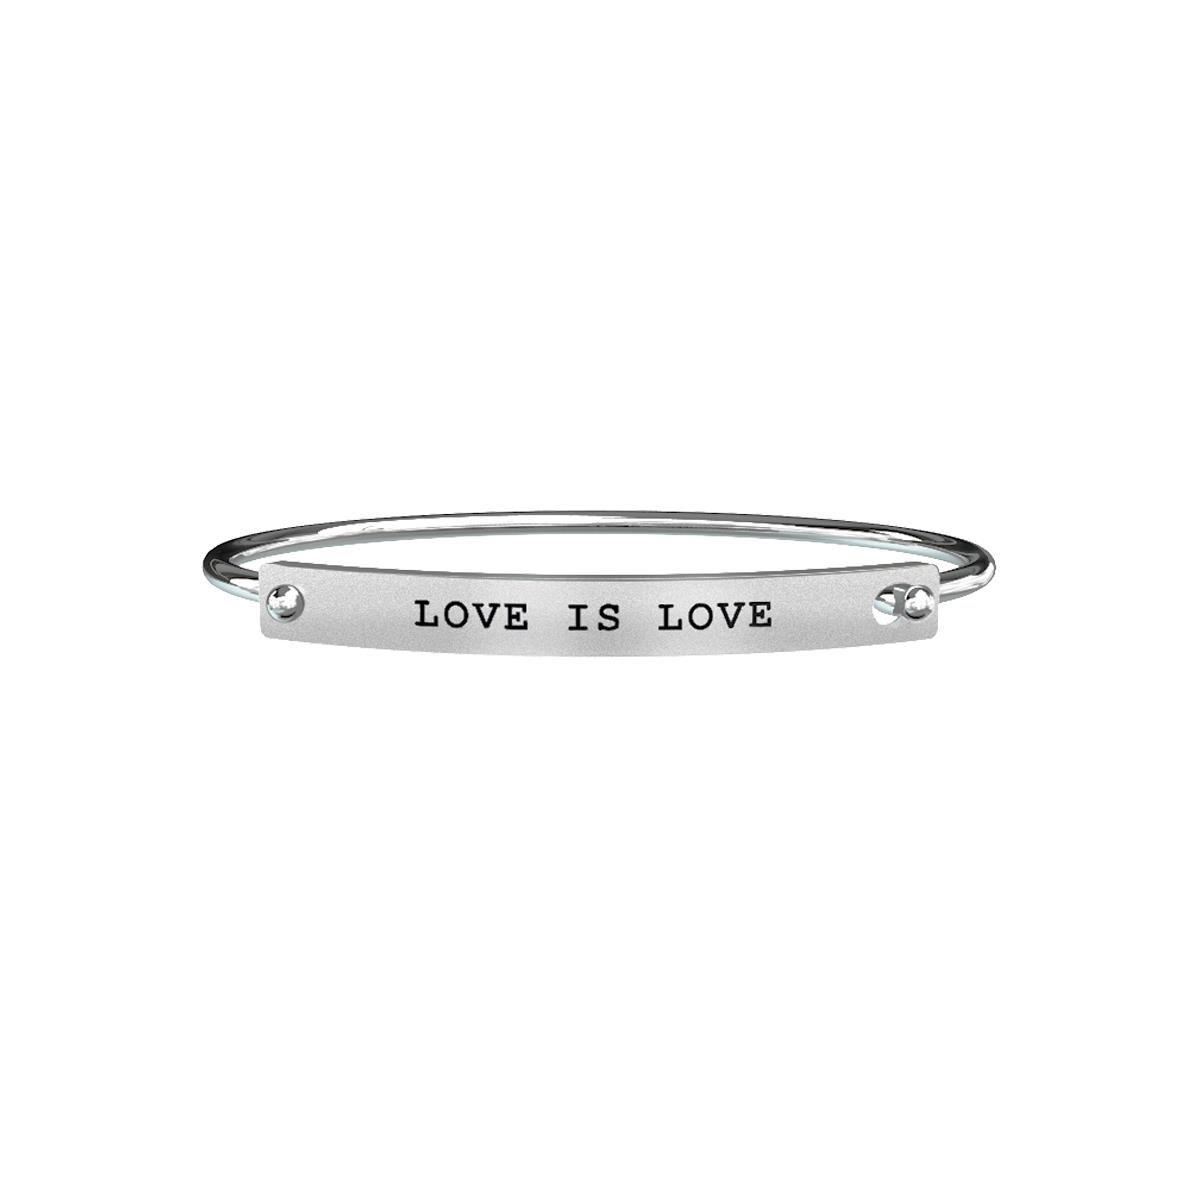 Bracciale Love Uomo Acciaio Love is Love – Love – 731183 - KIDULT